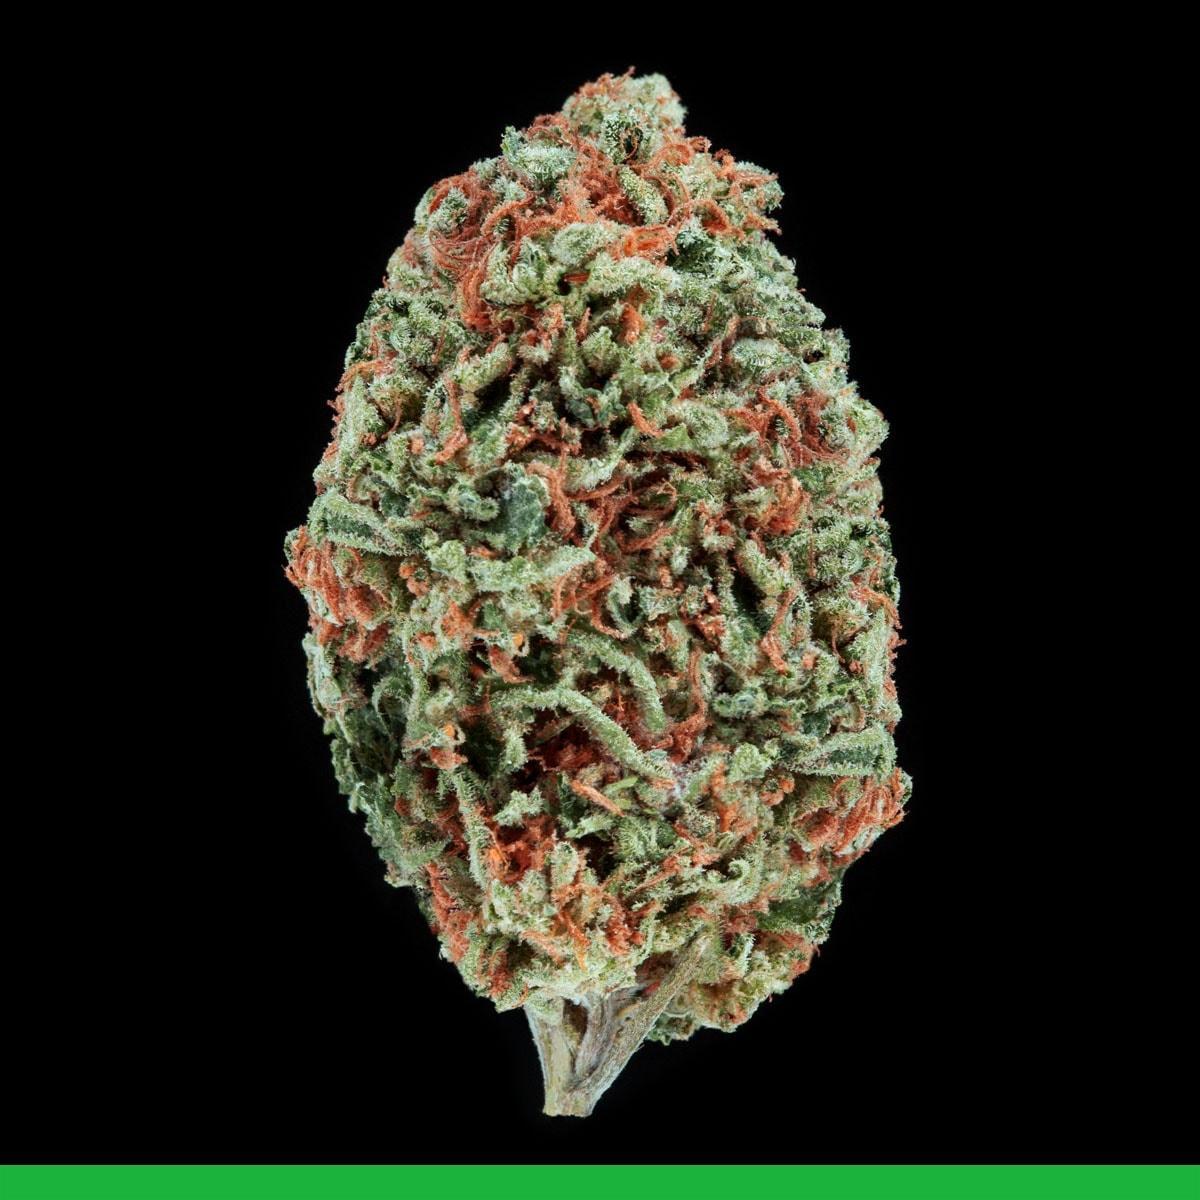 Island Girl Sativa Weed Strain